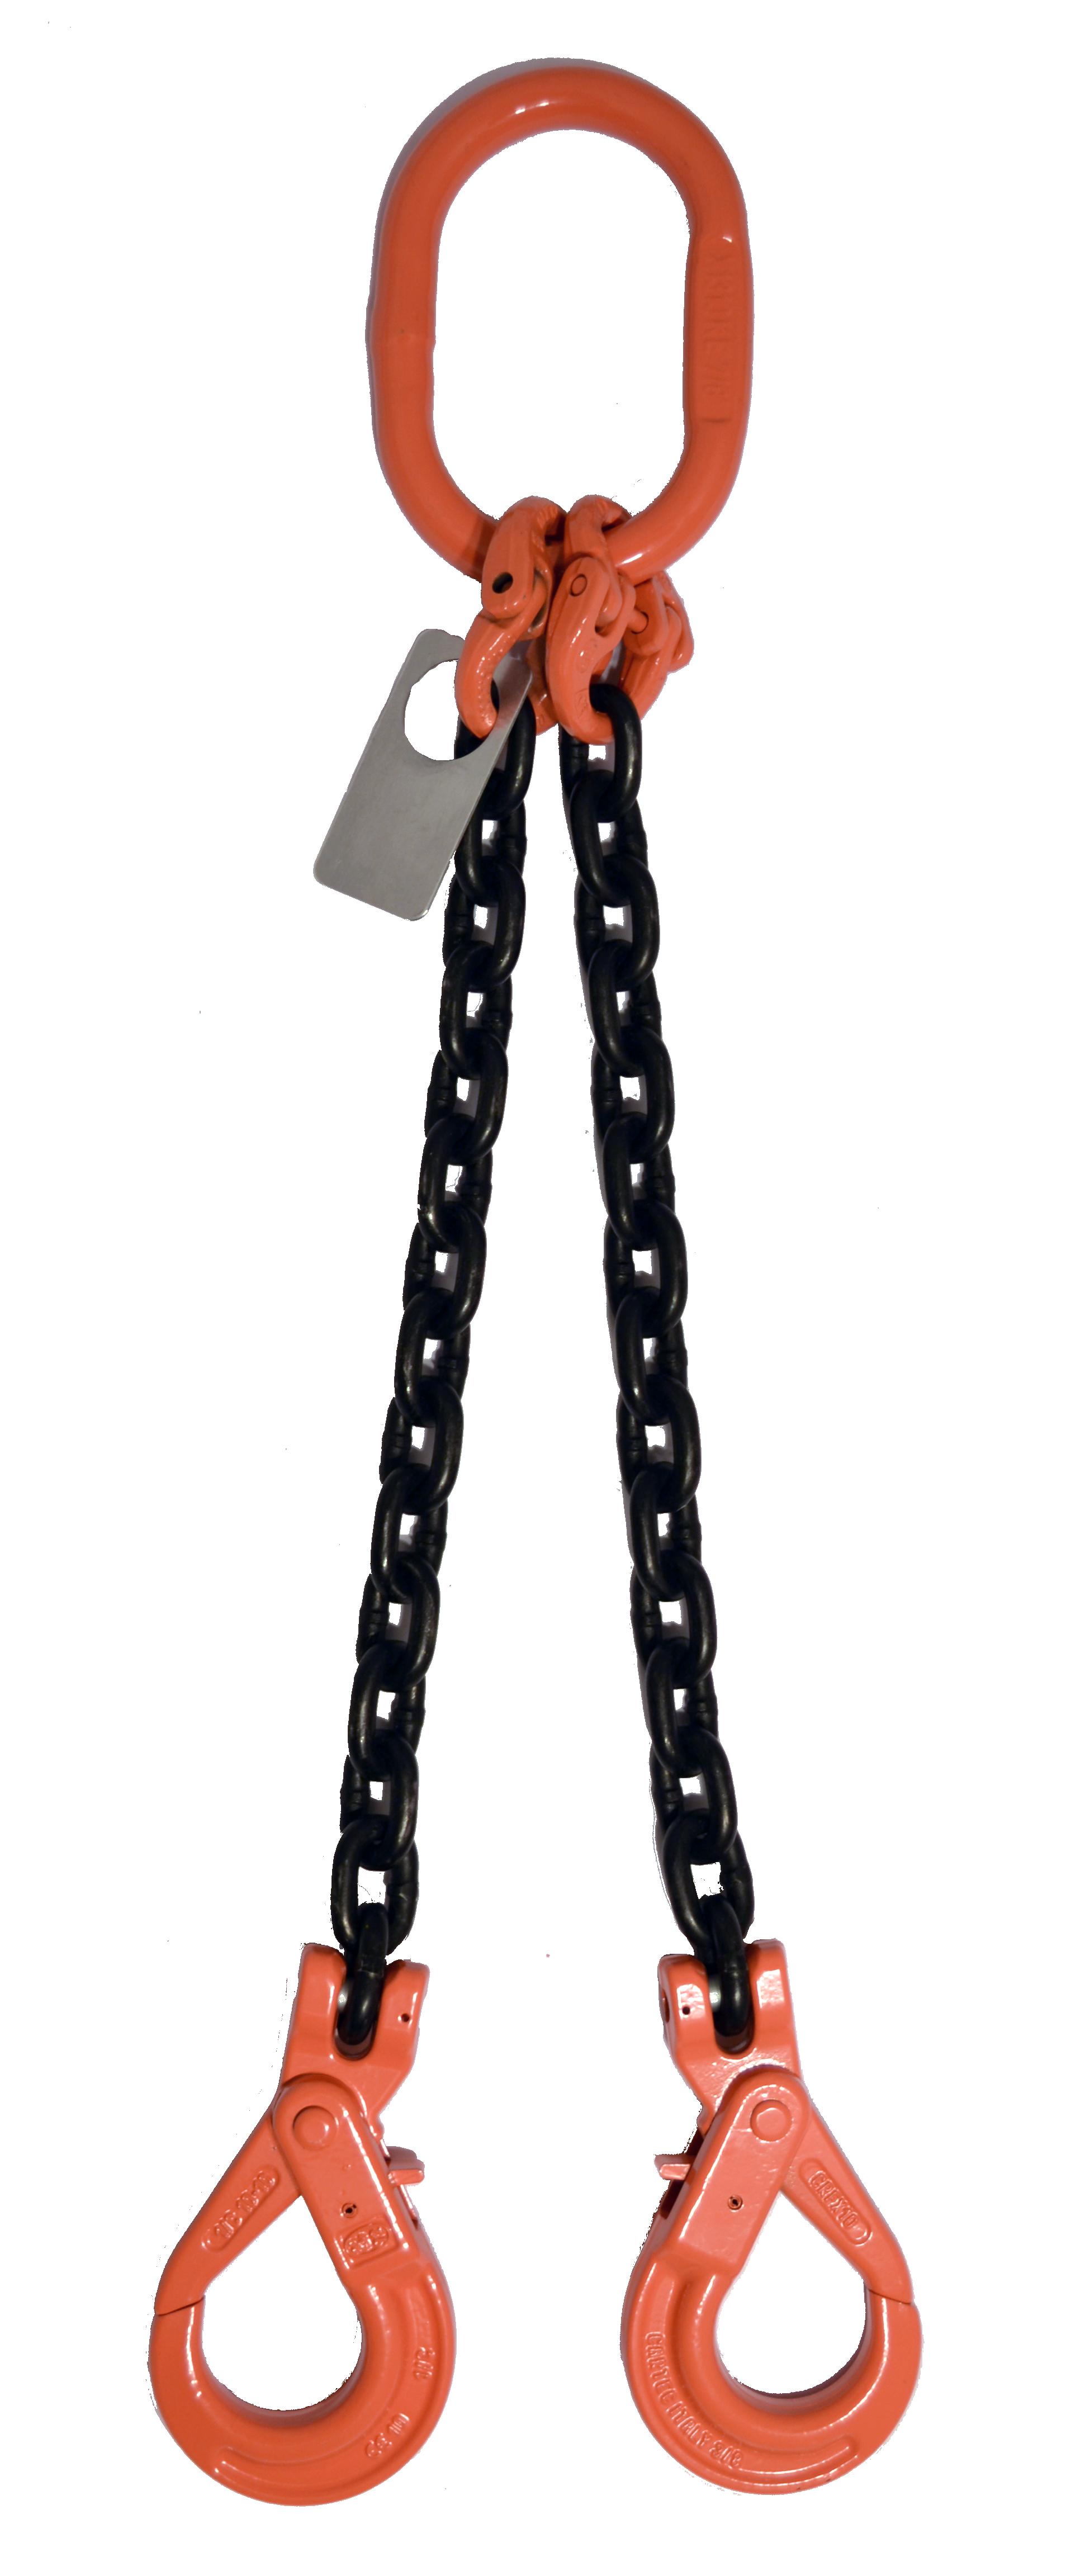 DOSL GR-100 Chain Sling